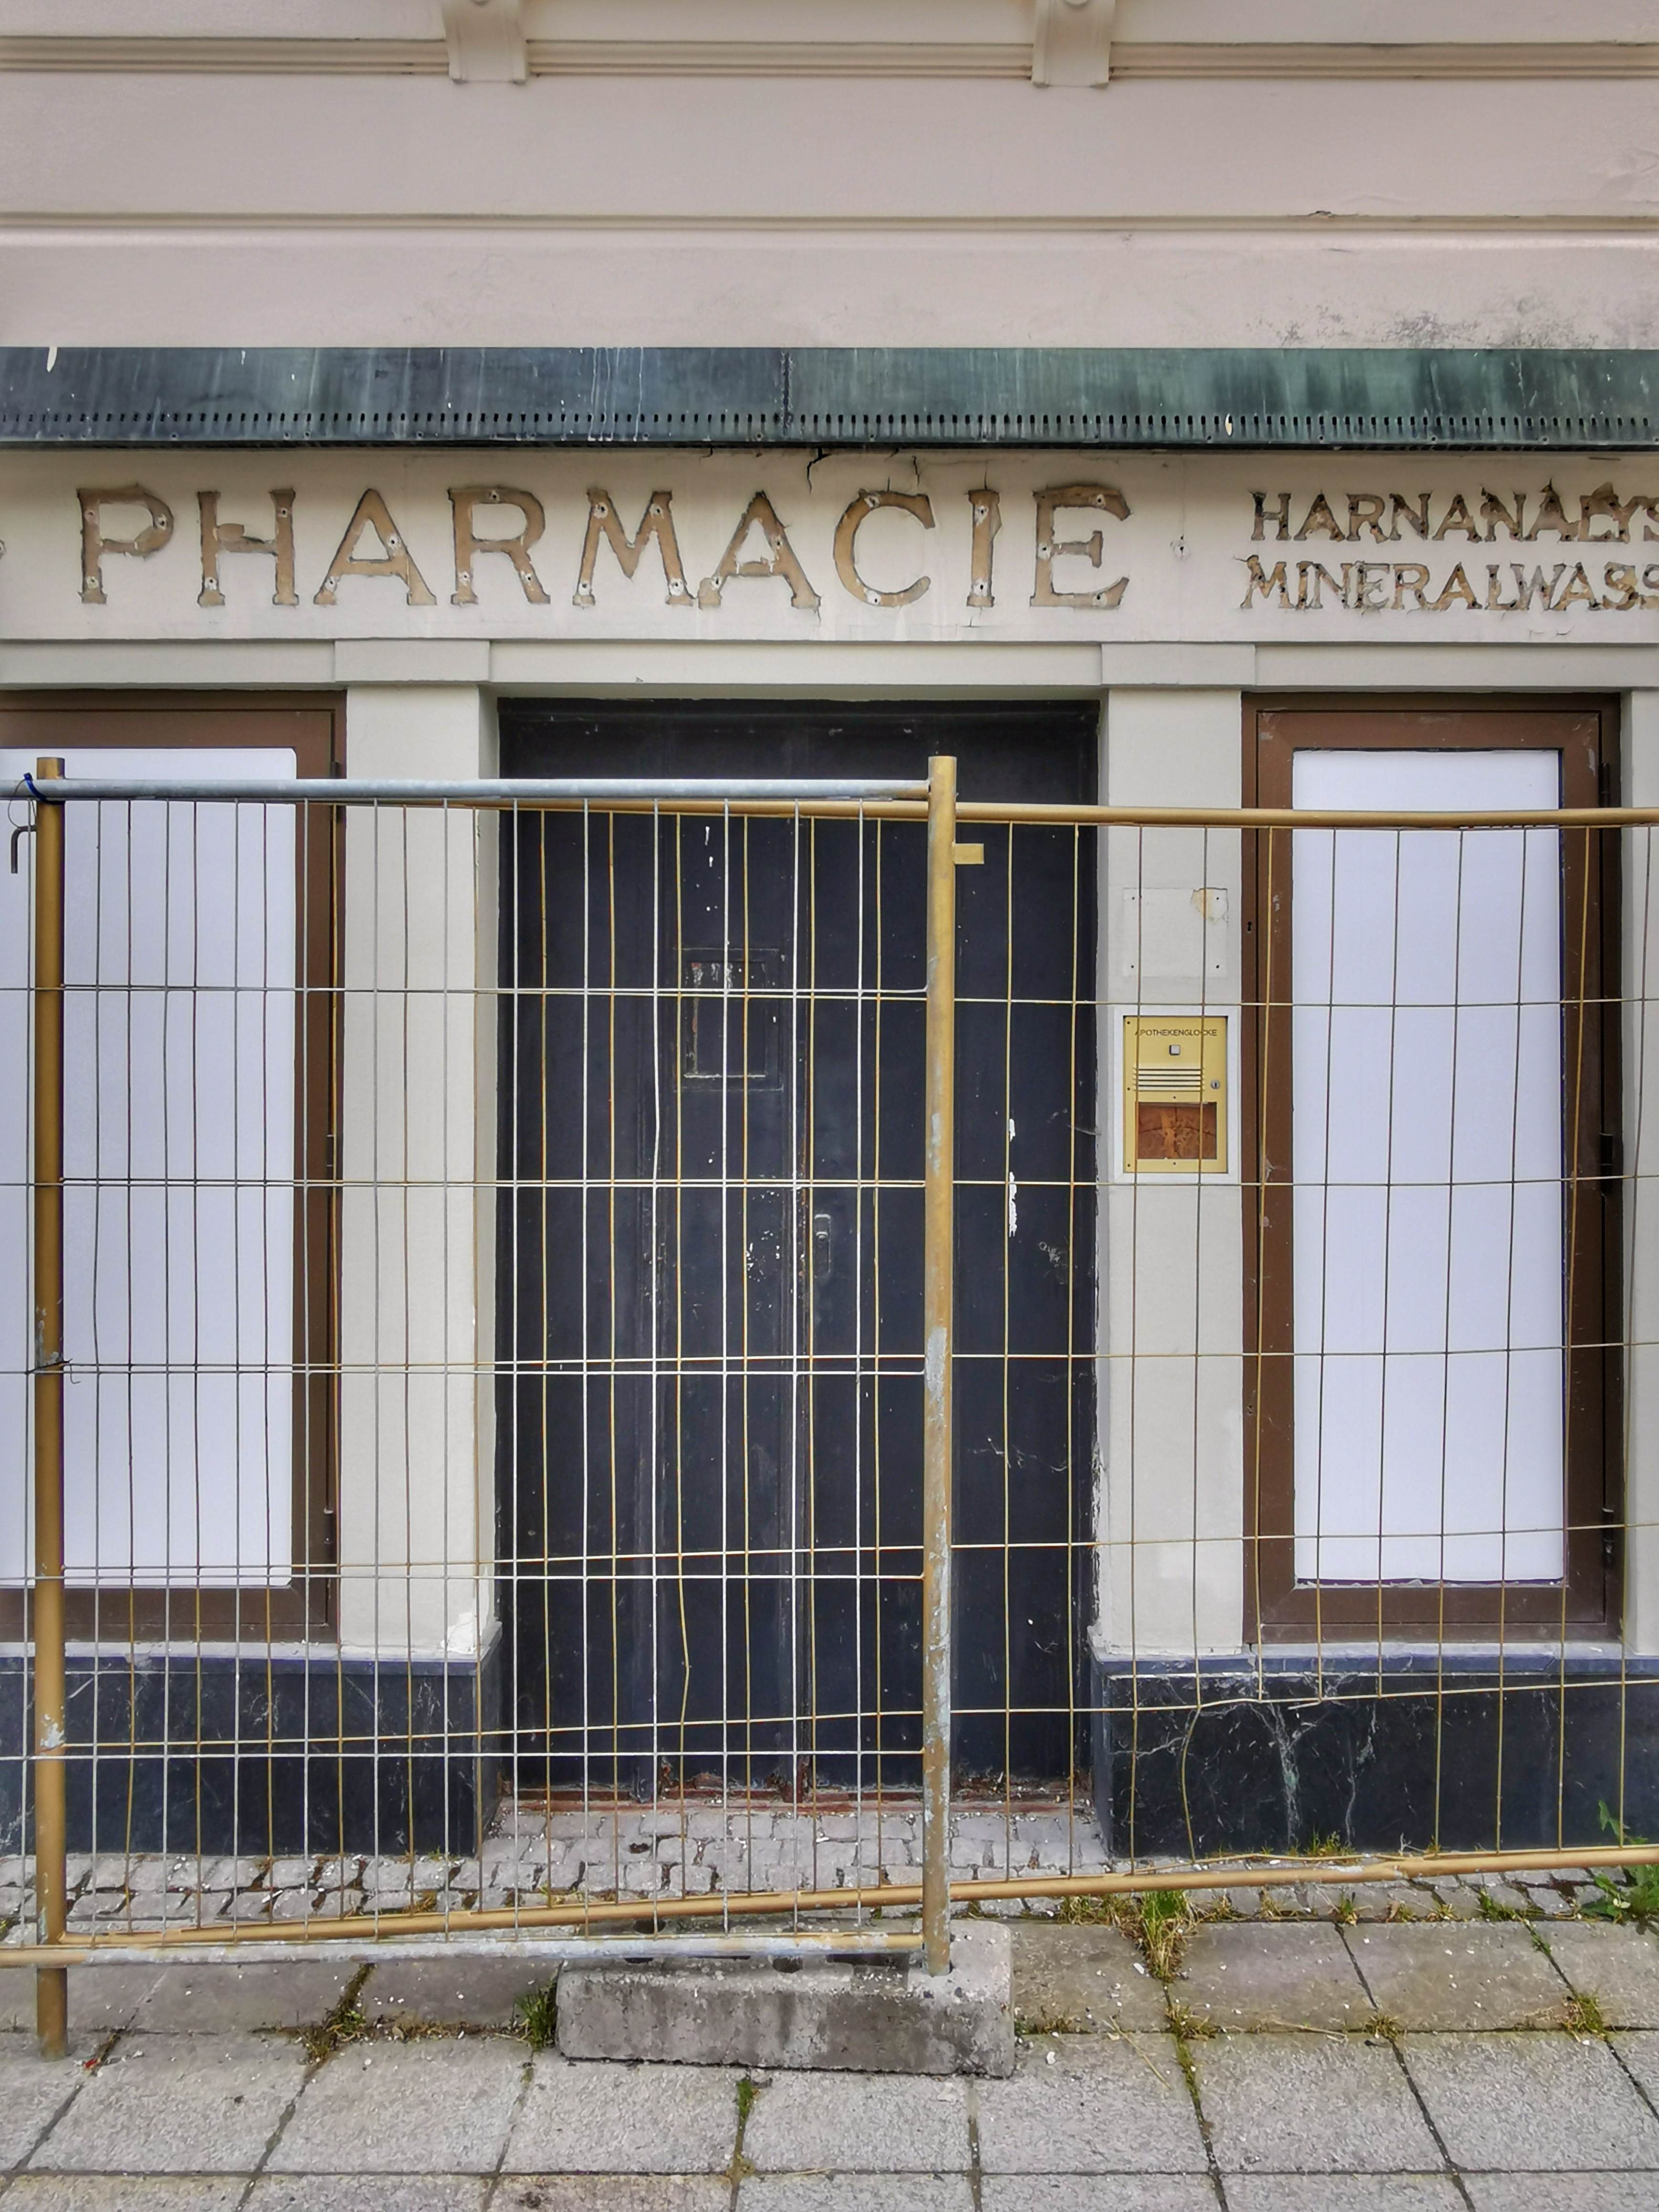 A former pharmacy in Bad Gastein